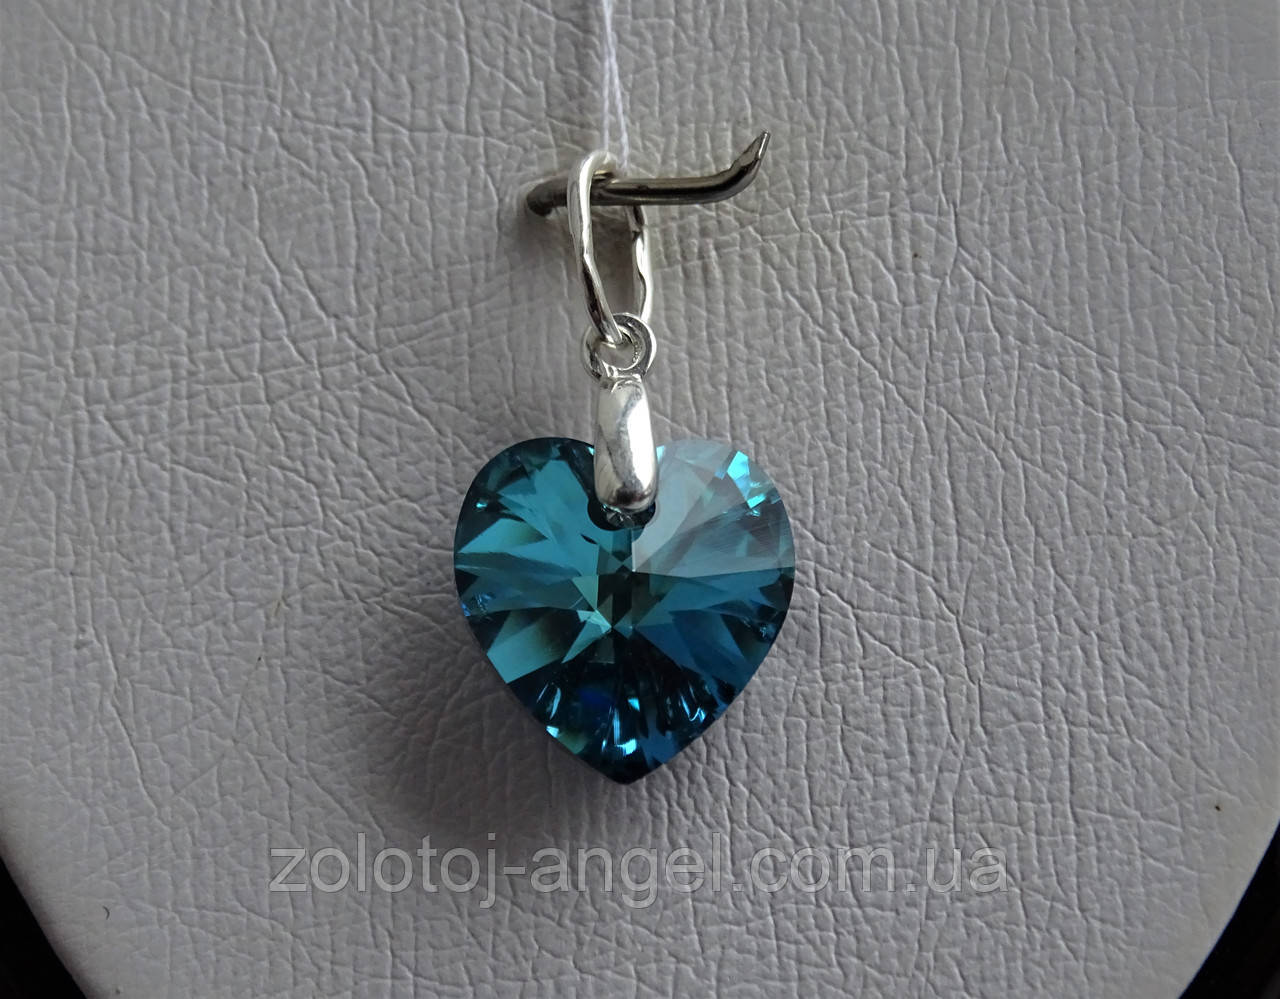 Хит!!!Серебряный кулон с  камнями Swarovski, кристаллы Сваровски ,Сердце океана,синее Сердце титаник,